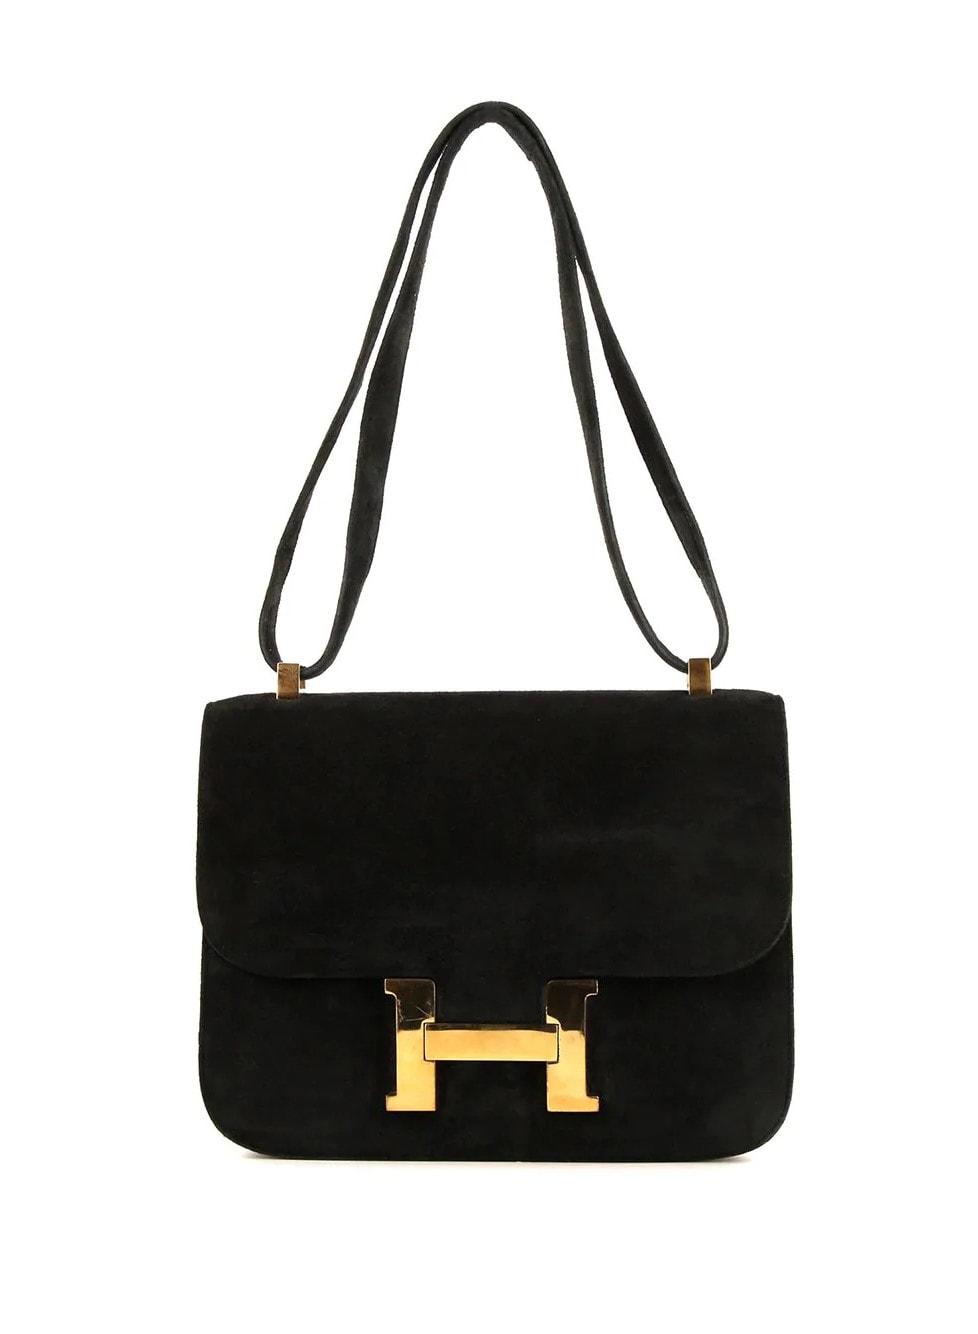 Hermès 1983 pre-owned Constance Shoulder Bag - Farfetch